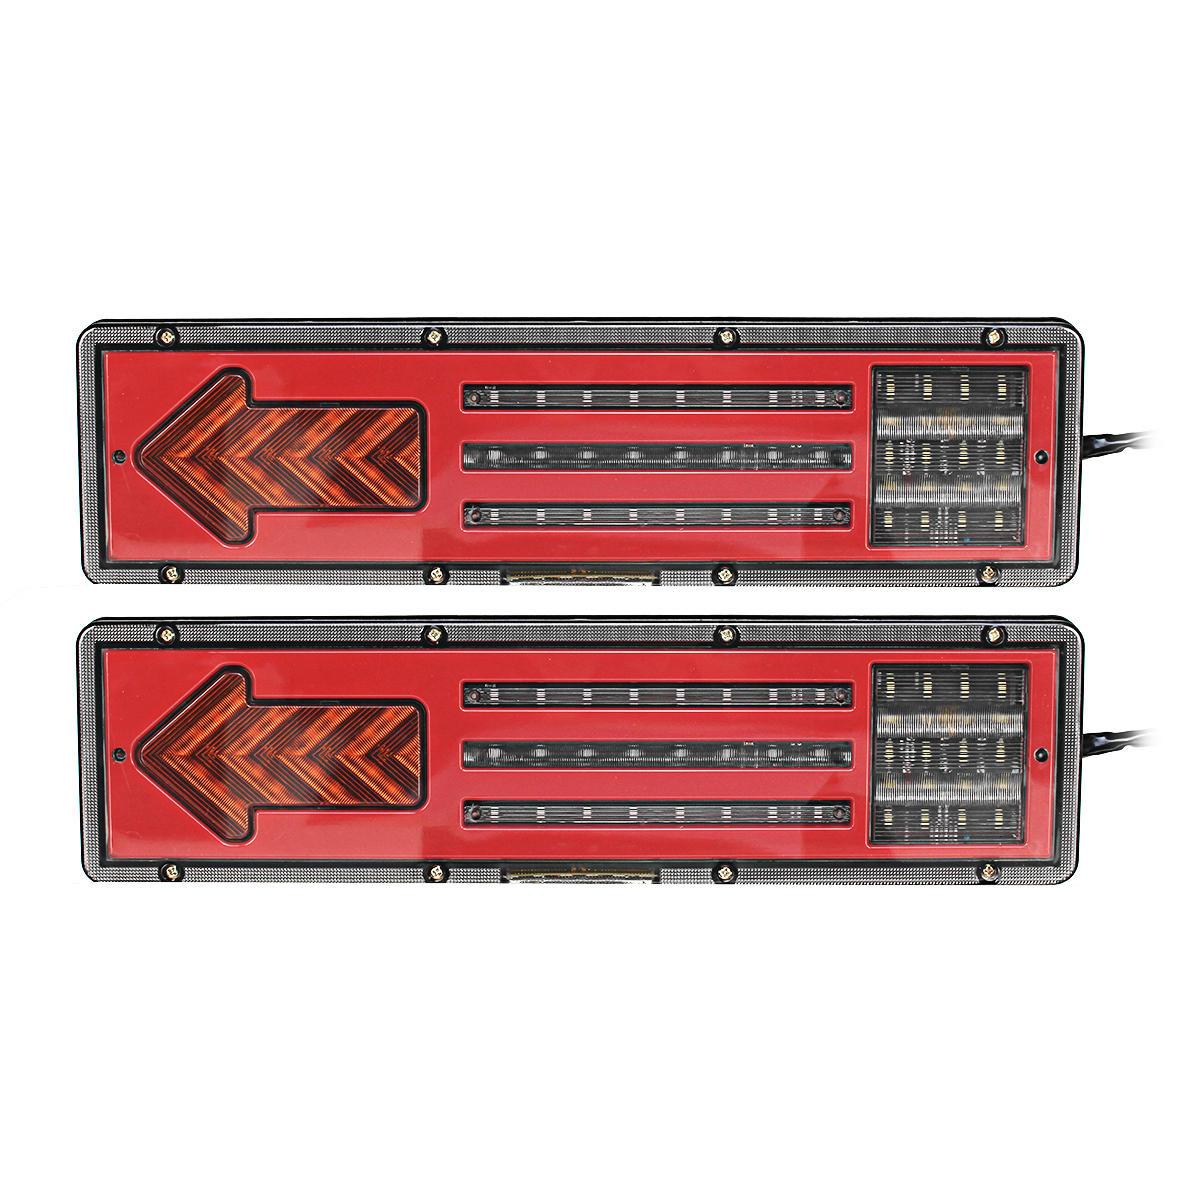 2Pcs 24V LED Tail Lights Brake Turn Indicator Lamps For Car Truck Caravan Trailer